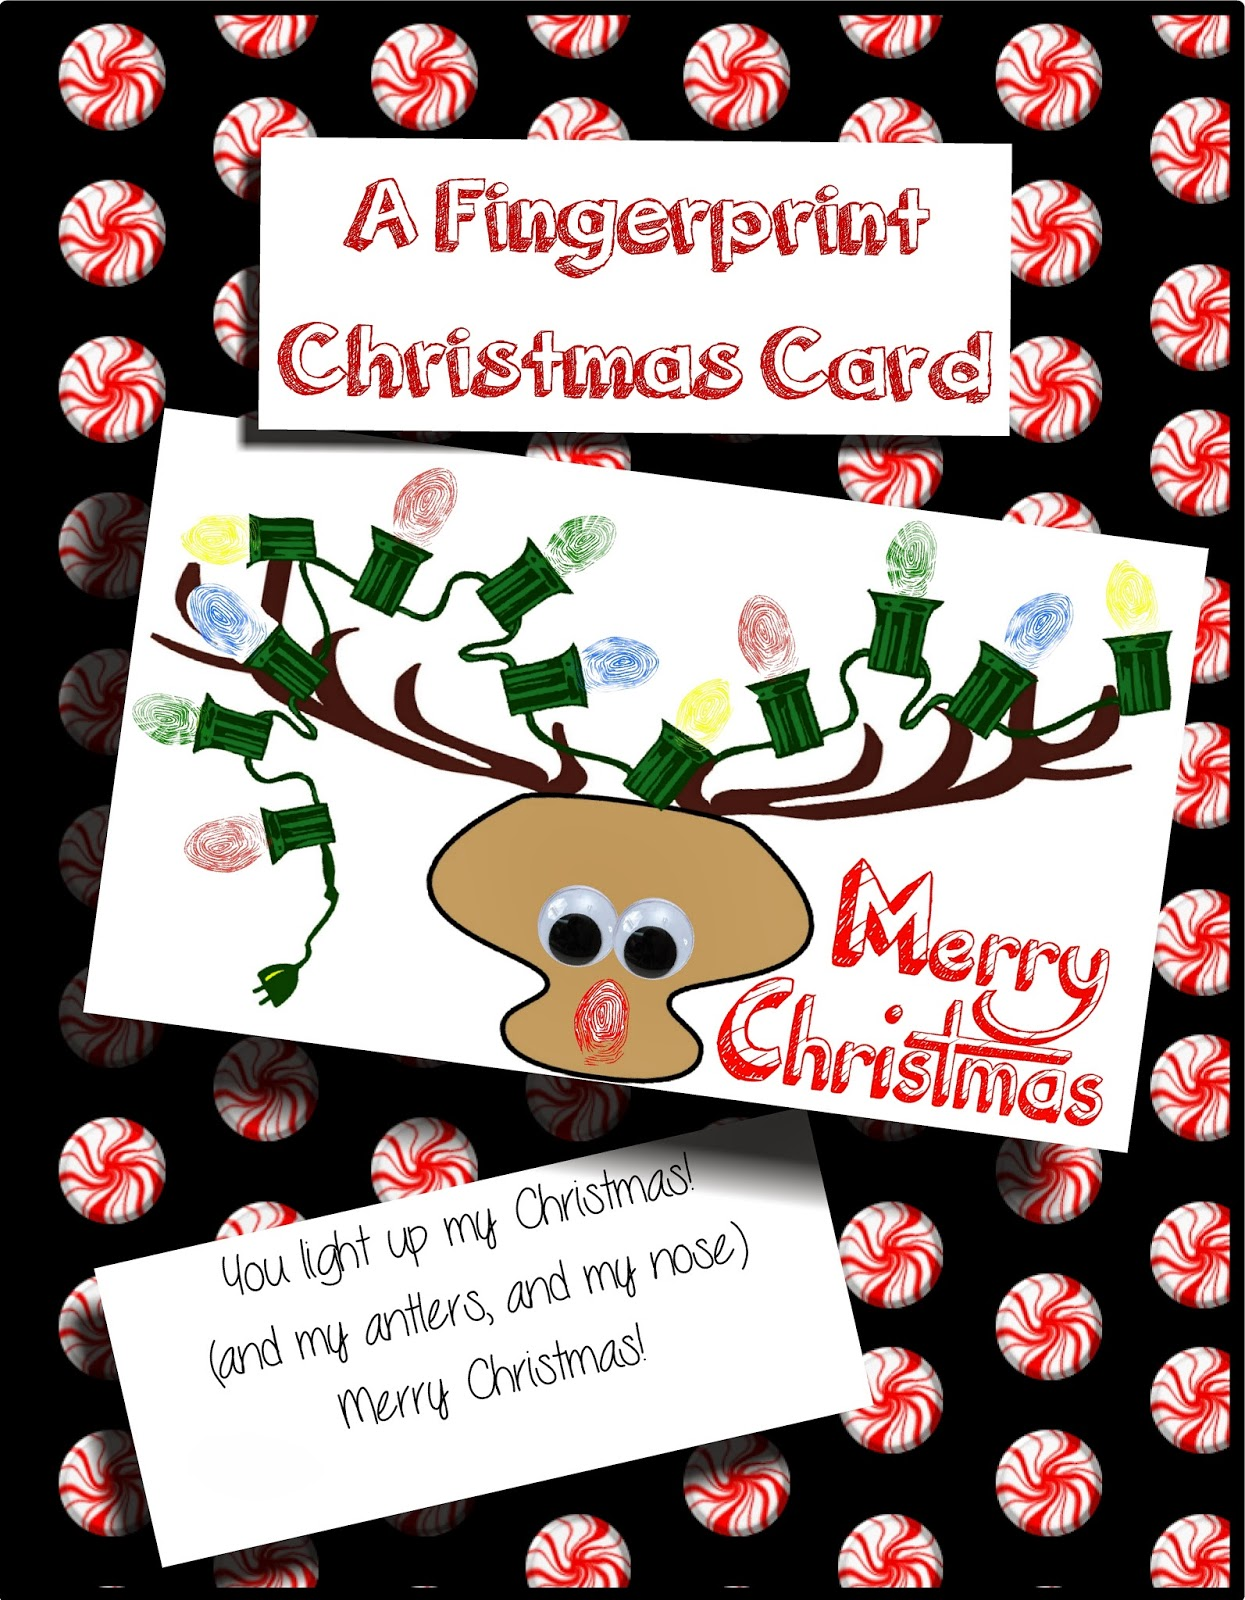 HollysHome Family Life: A Fingerprint Reindeer Christmas Card